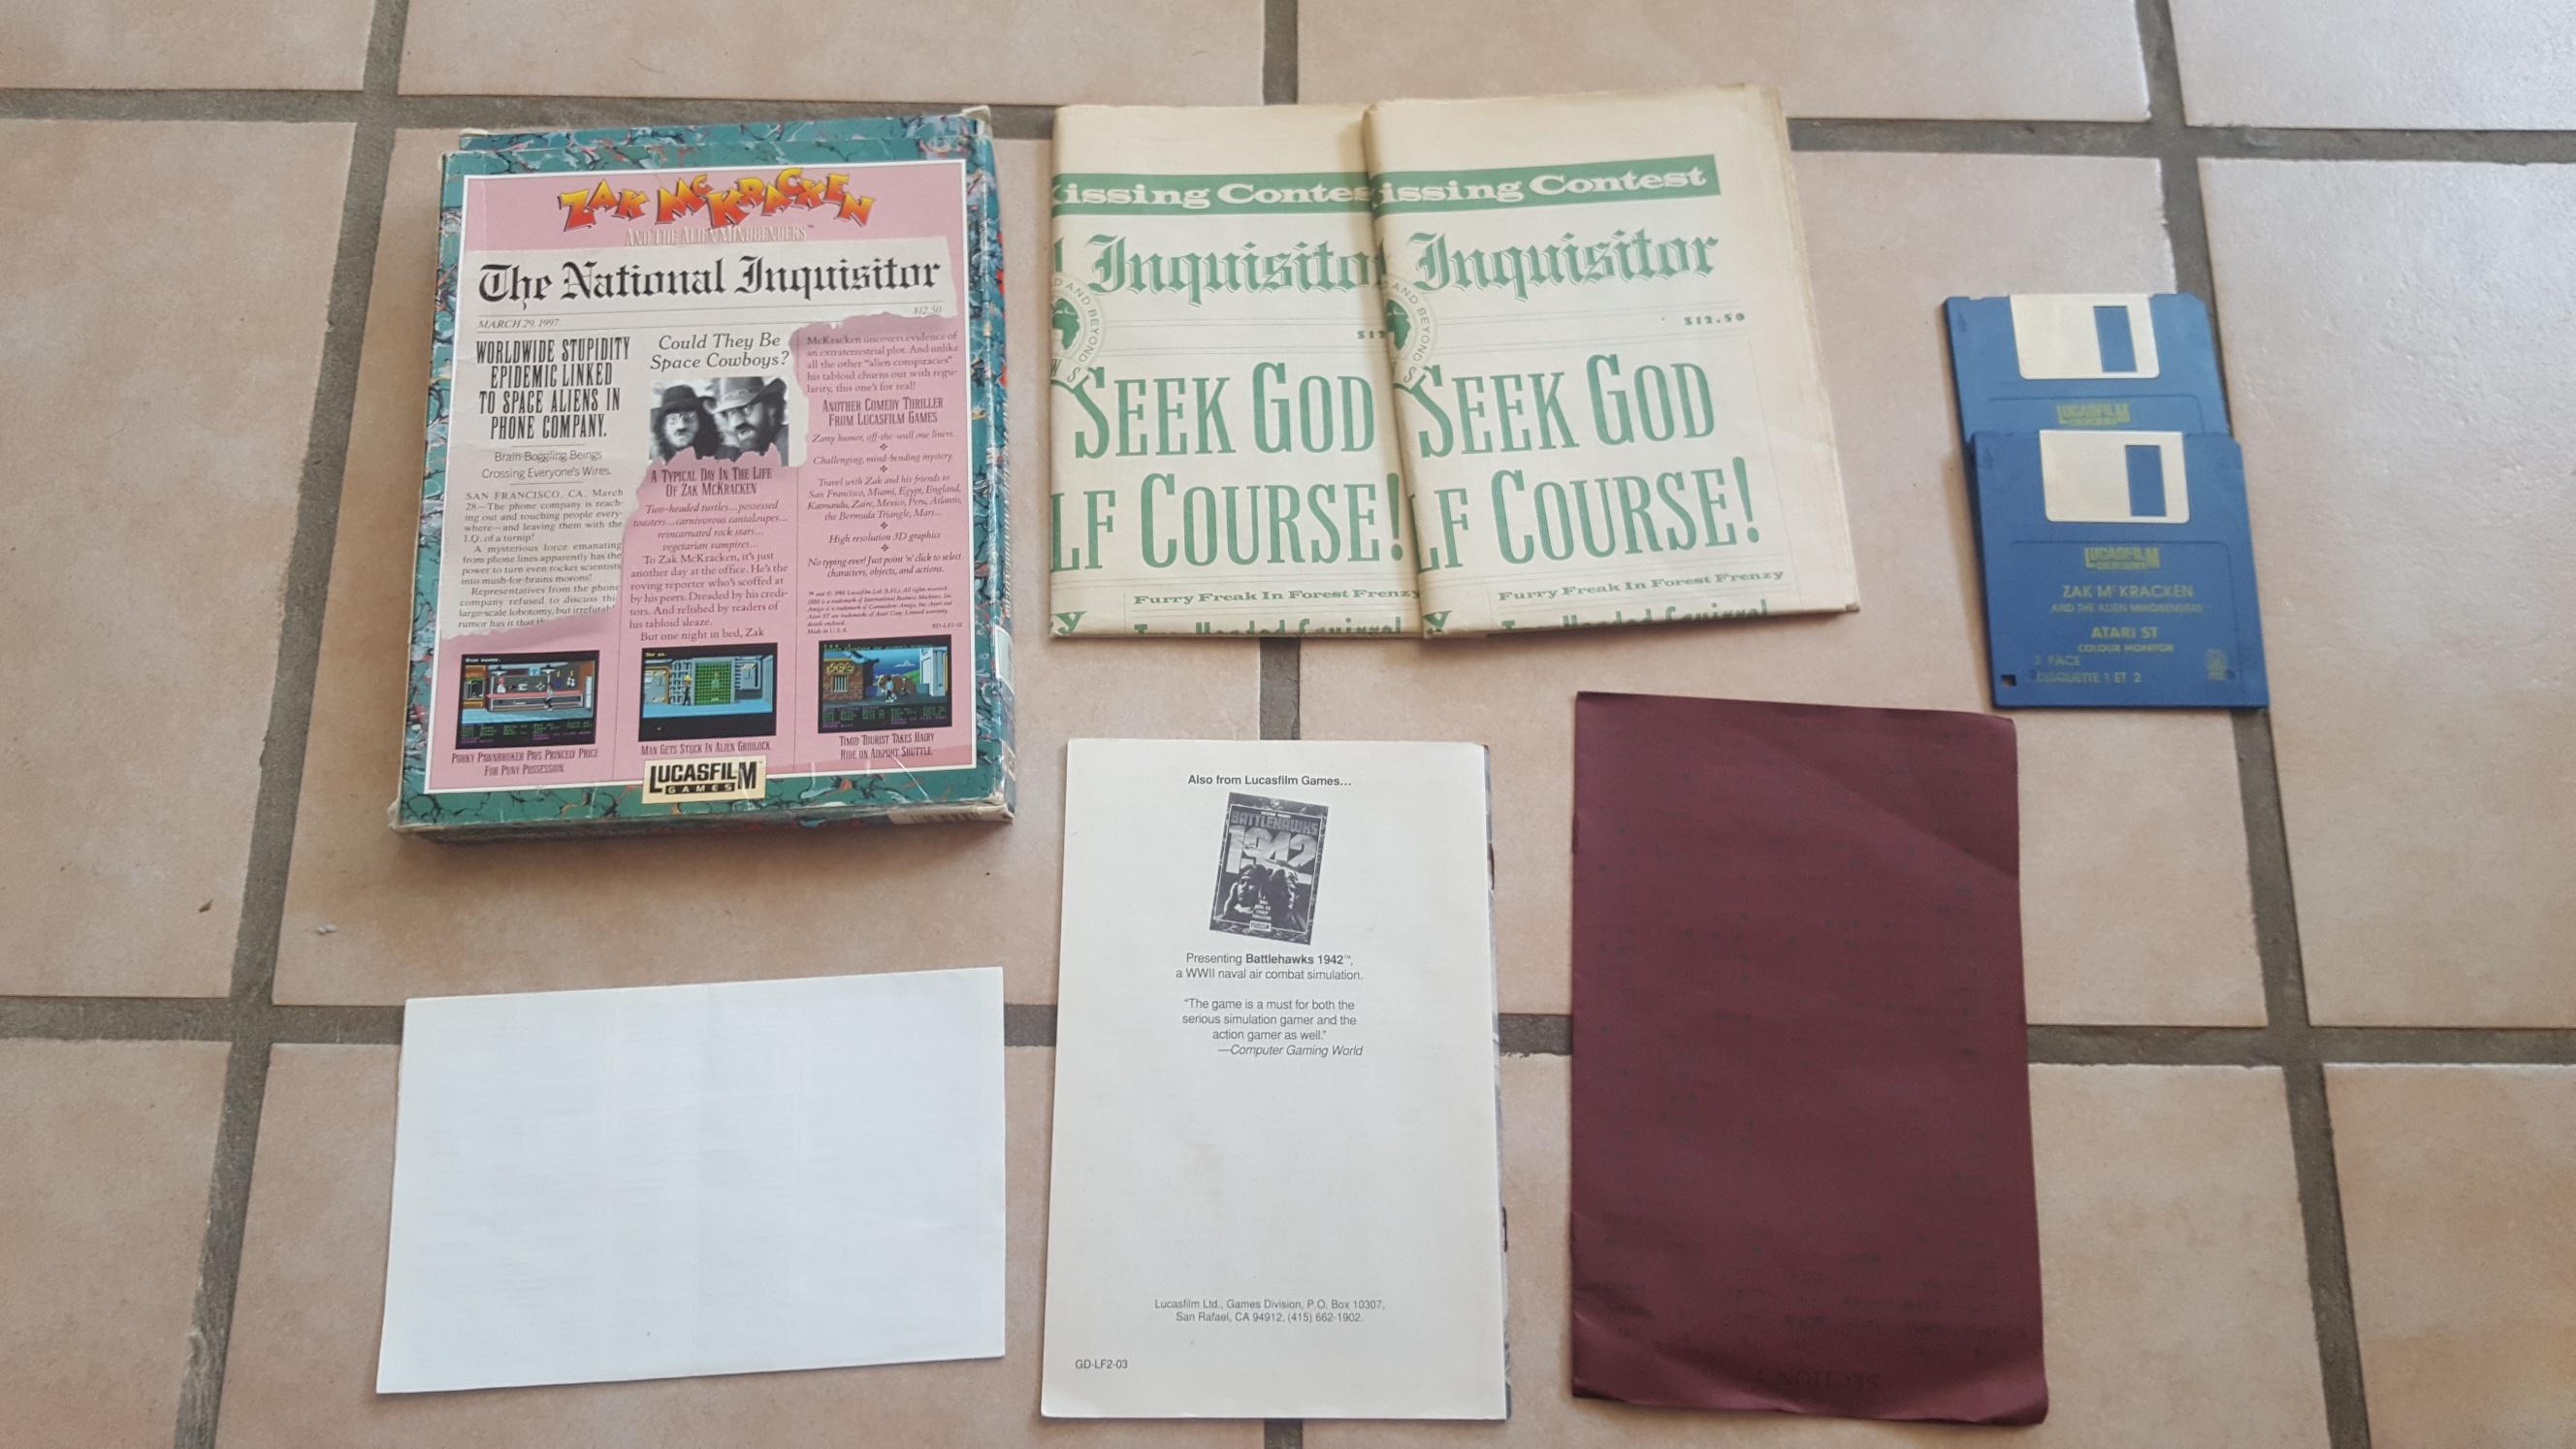 Vente ordinateurs et jeux Atari, Amiga, Amstrad et PC MAJ 20/01 - Page 6 3NQm8